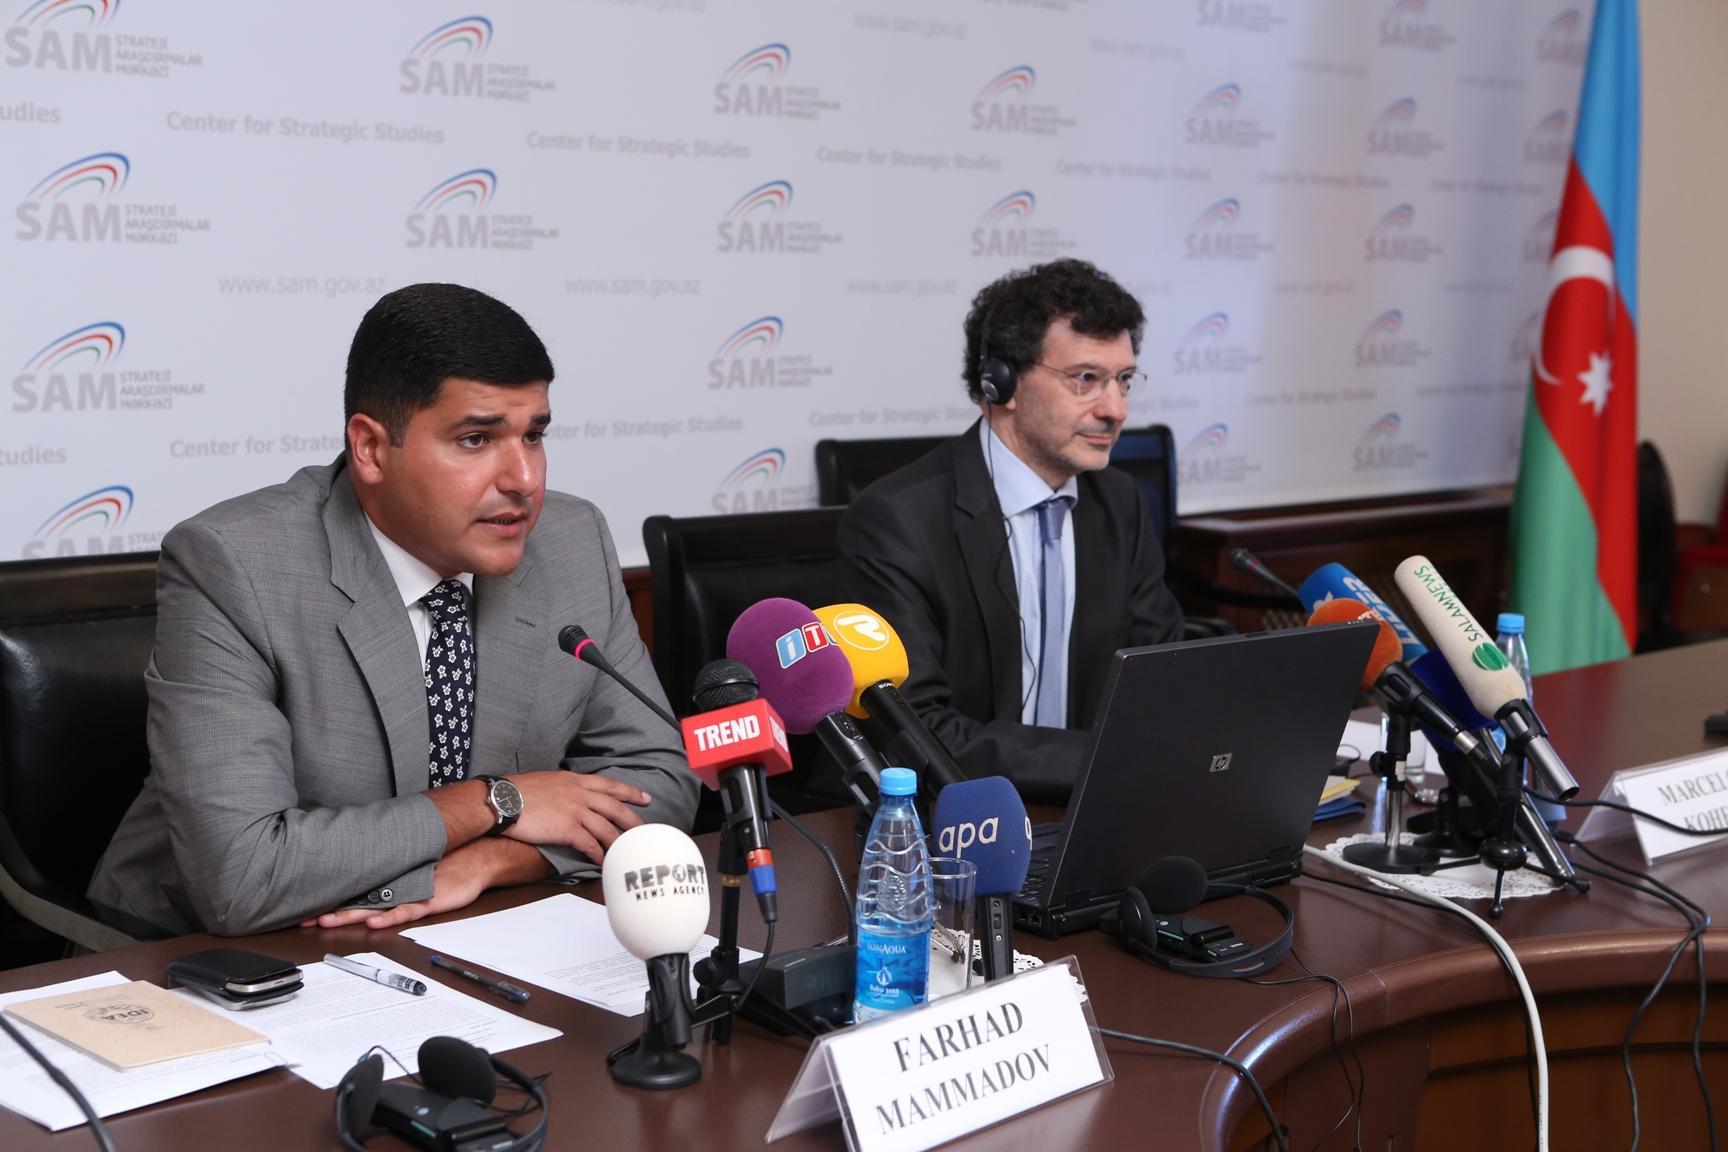 Член Института Международного Права: Армяне Нагорного Карабаха не имеют права на самоопределение